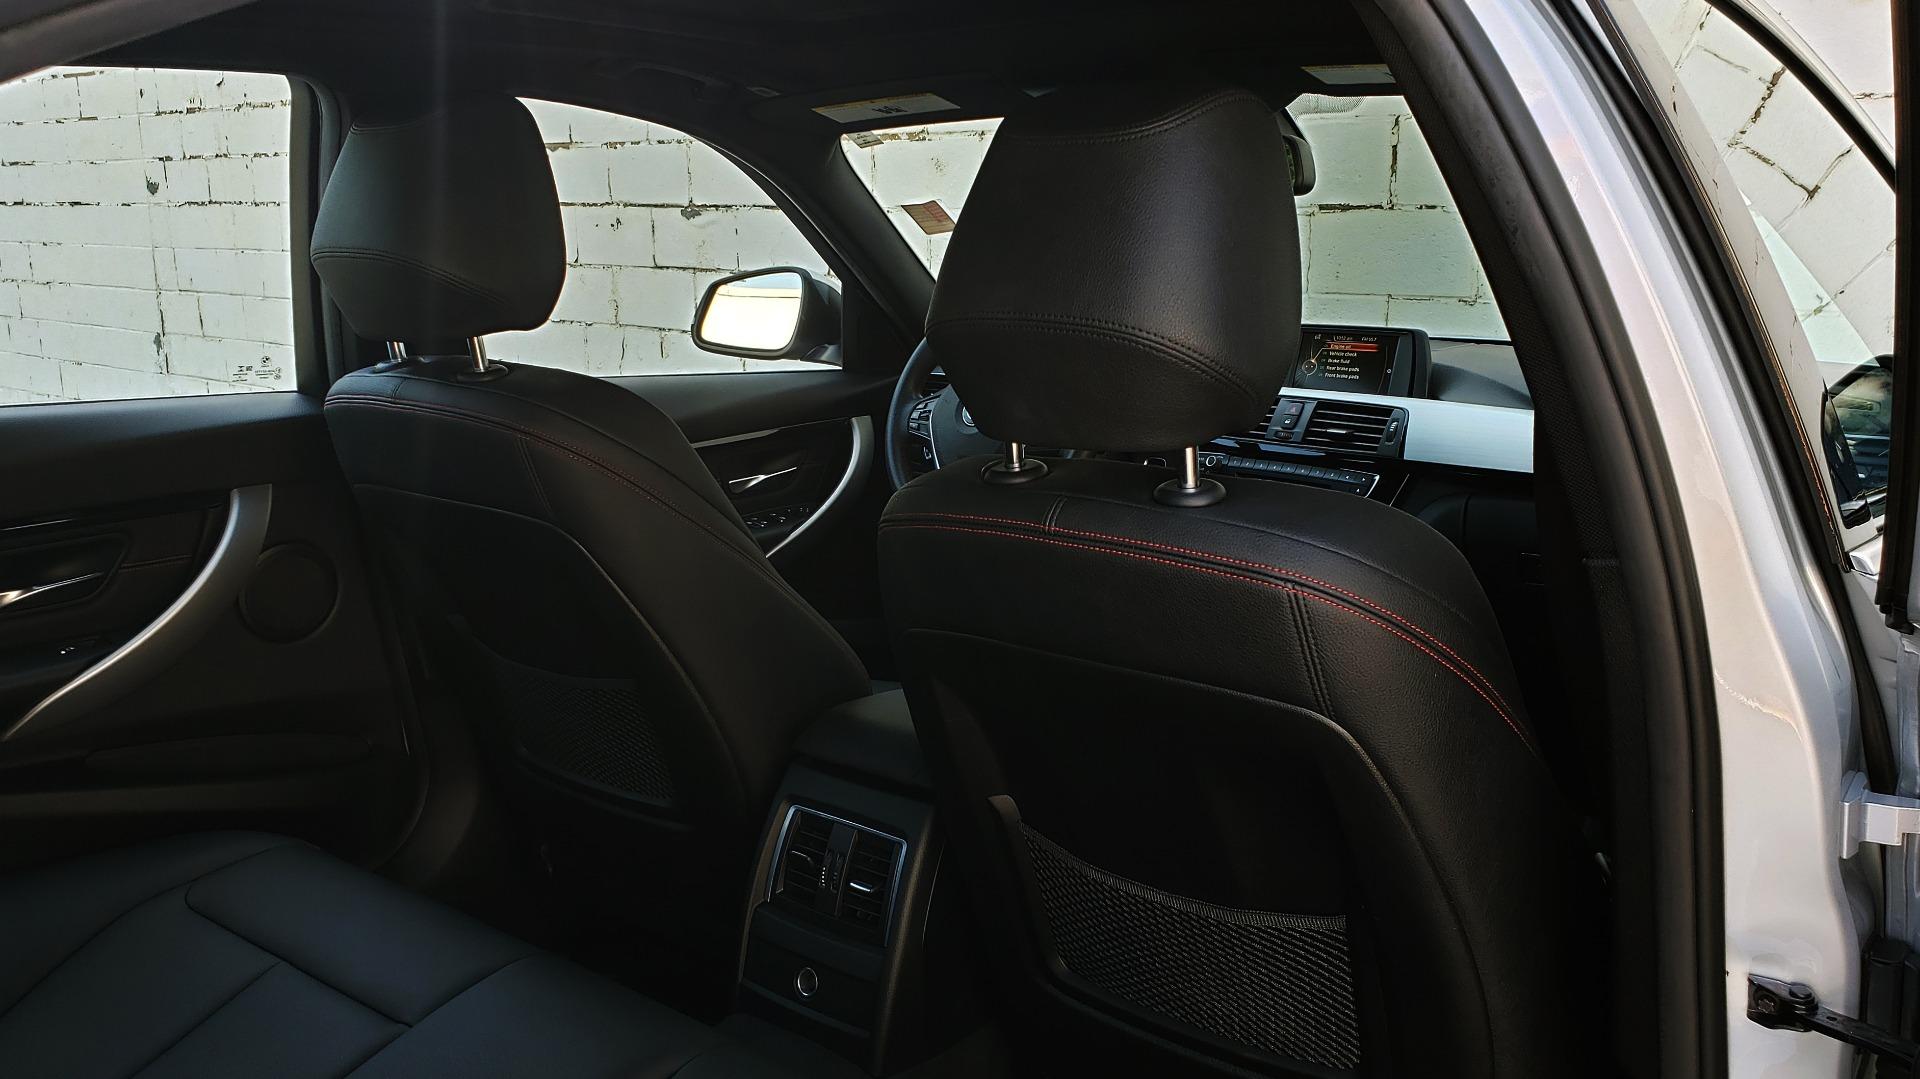 Used 2017 BMW 3 SERIES 330I SPORT SEDAN / DRVR ASST PKG / SUNROOF / REARVIEW for sale Sold at Formula Imports in Charlotte NC 28227 73